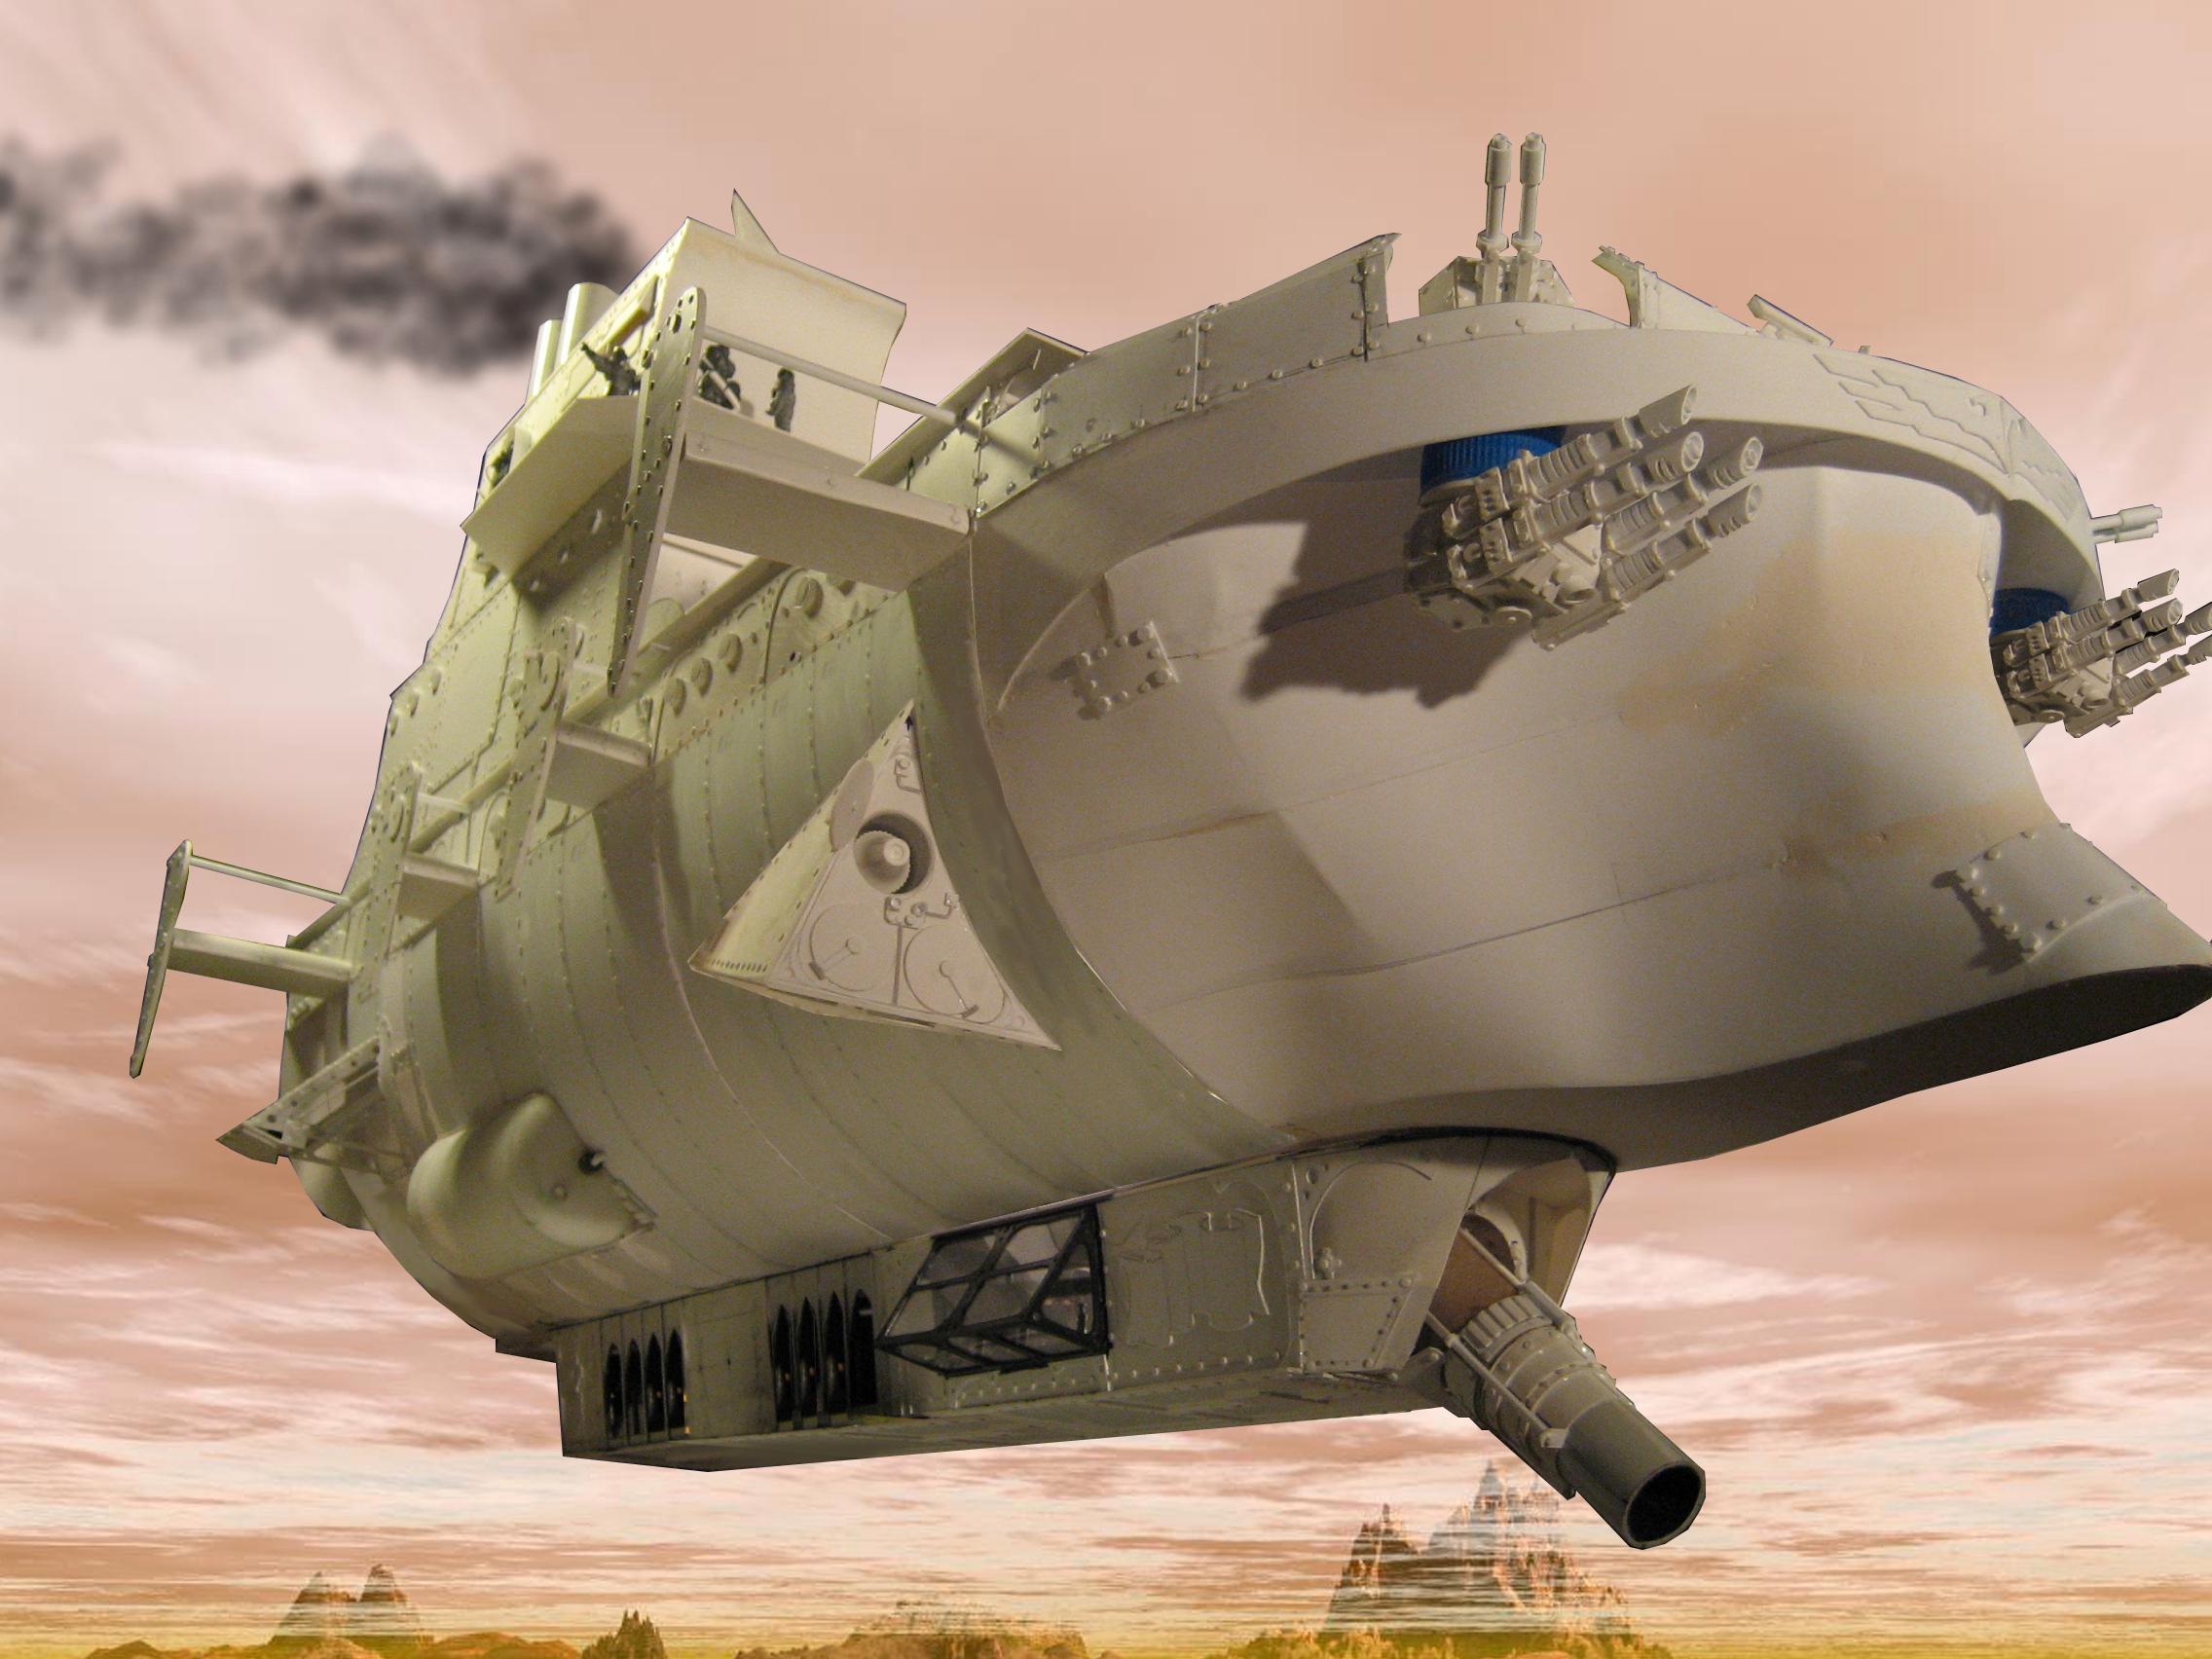 Aircraft Carrier, Airship, Blimp, Drogue, Steampunk